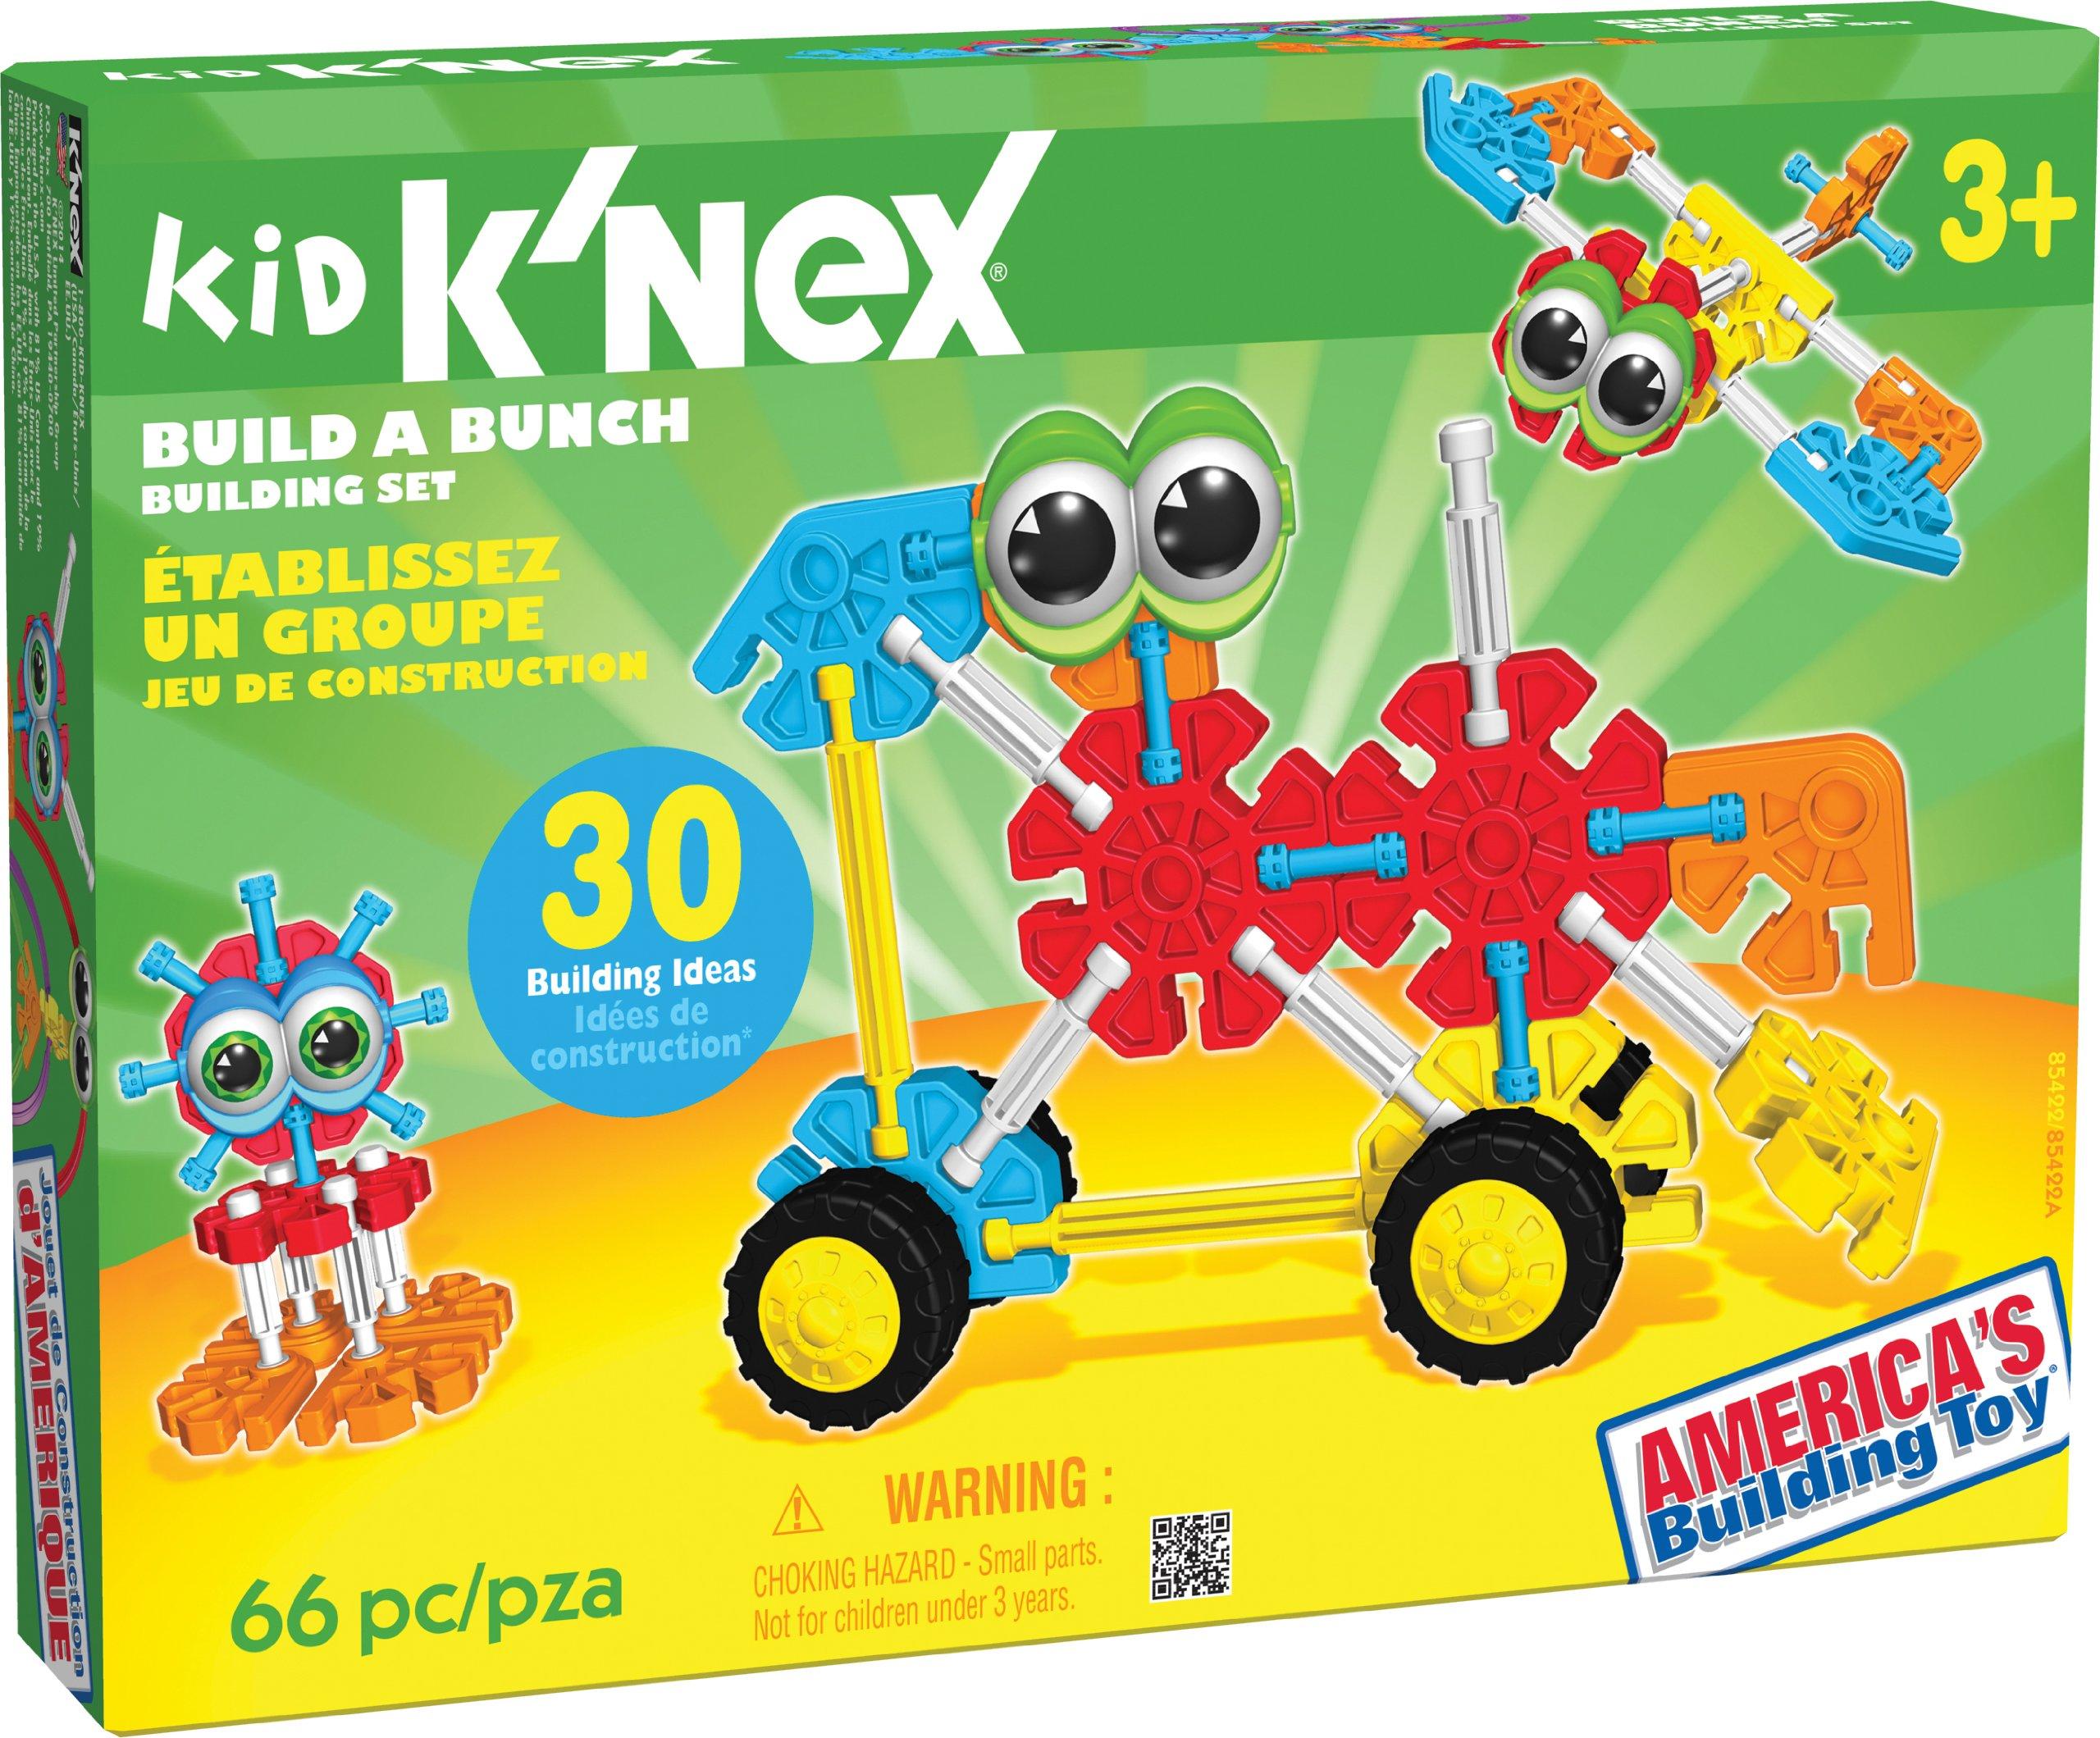 K Nex Kid Build a Bunch Building Set